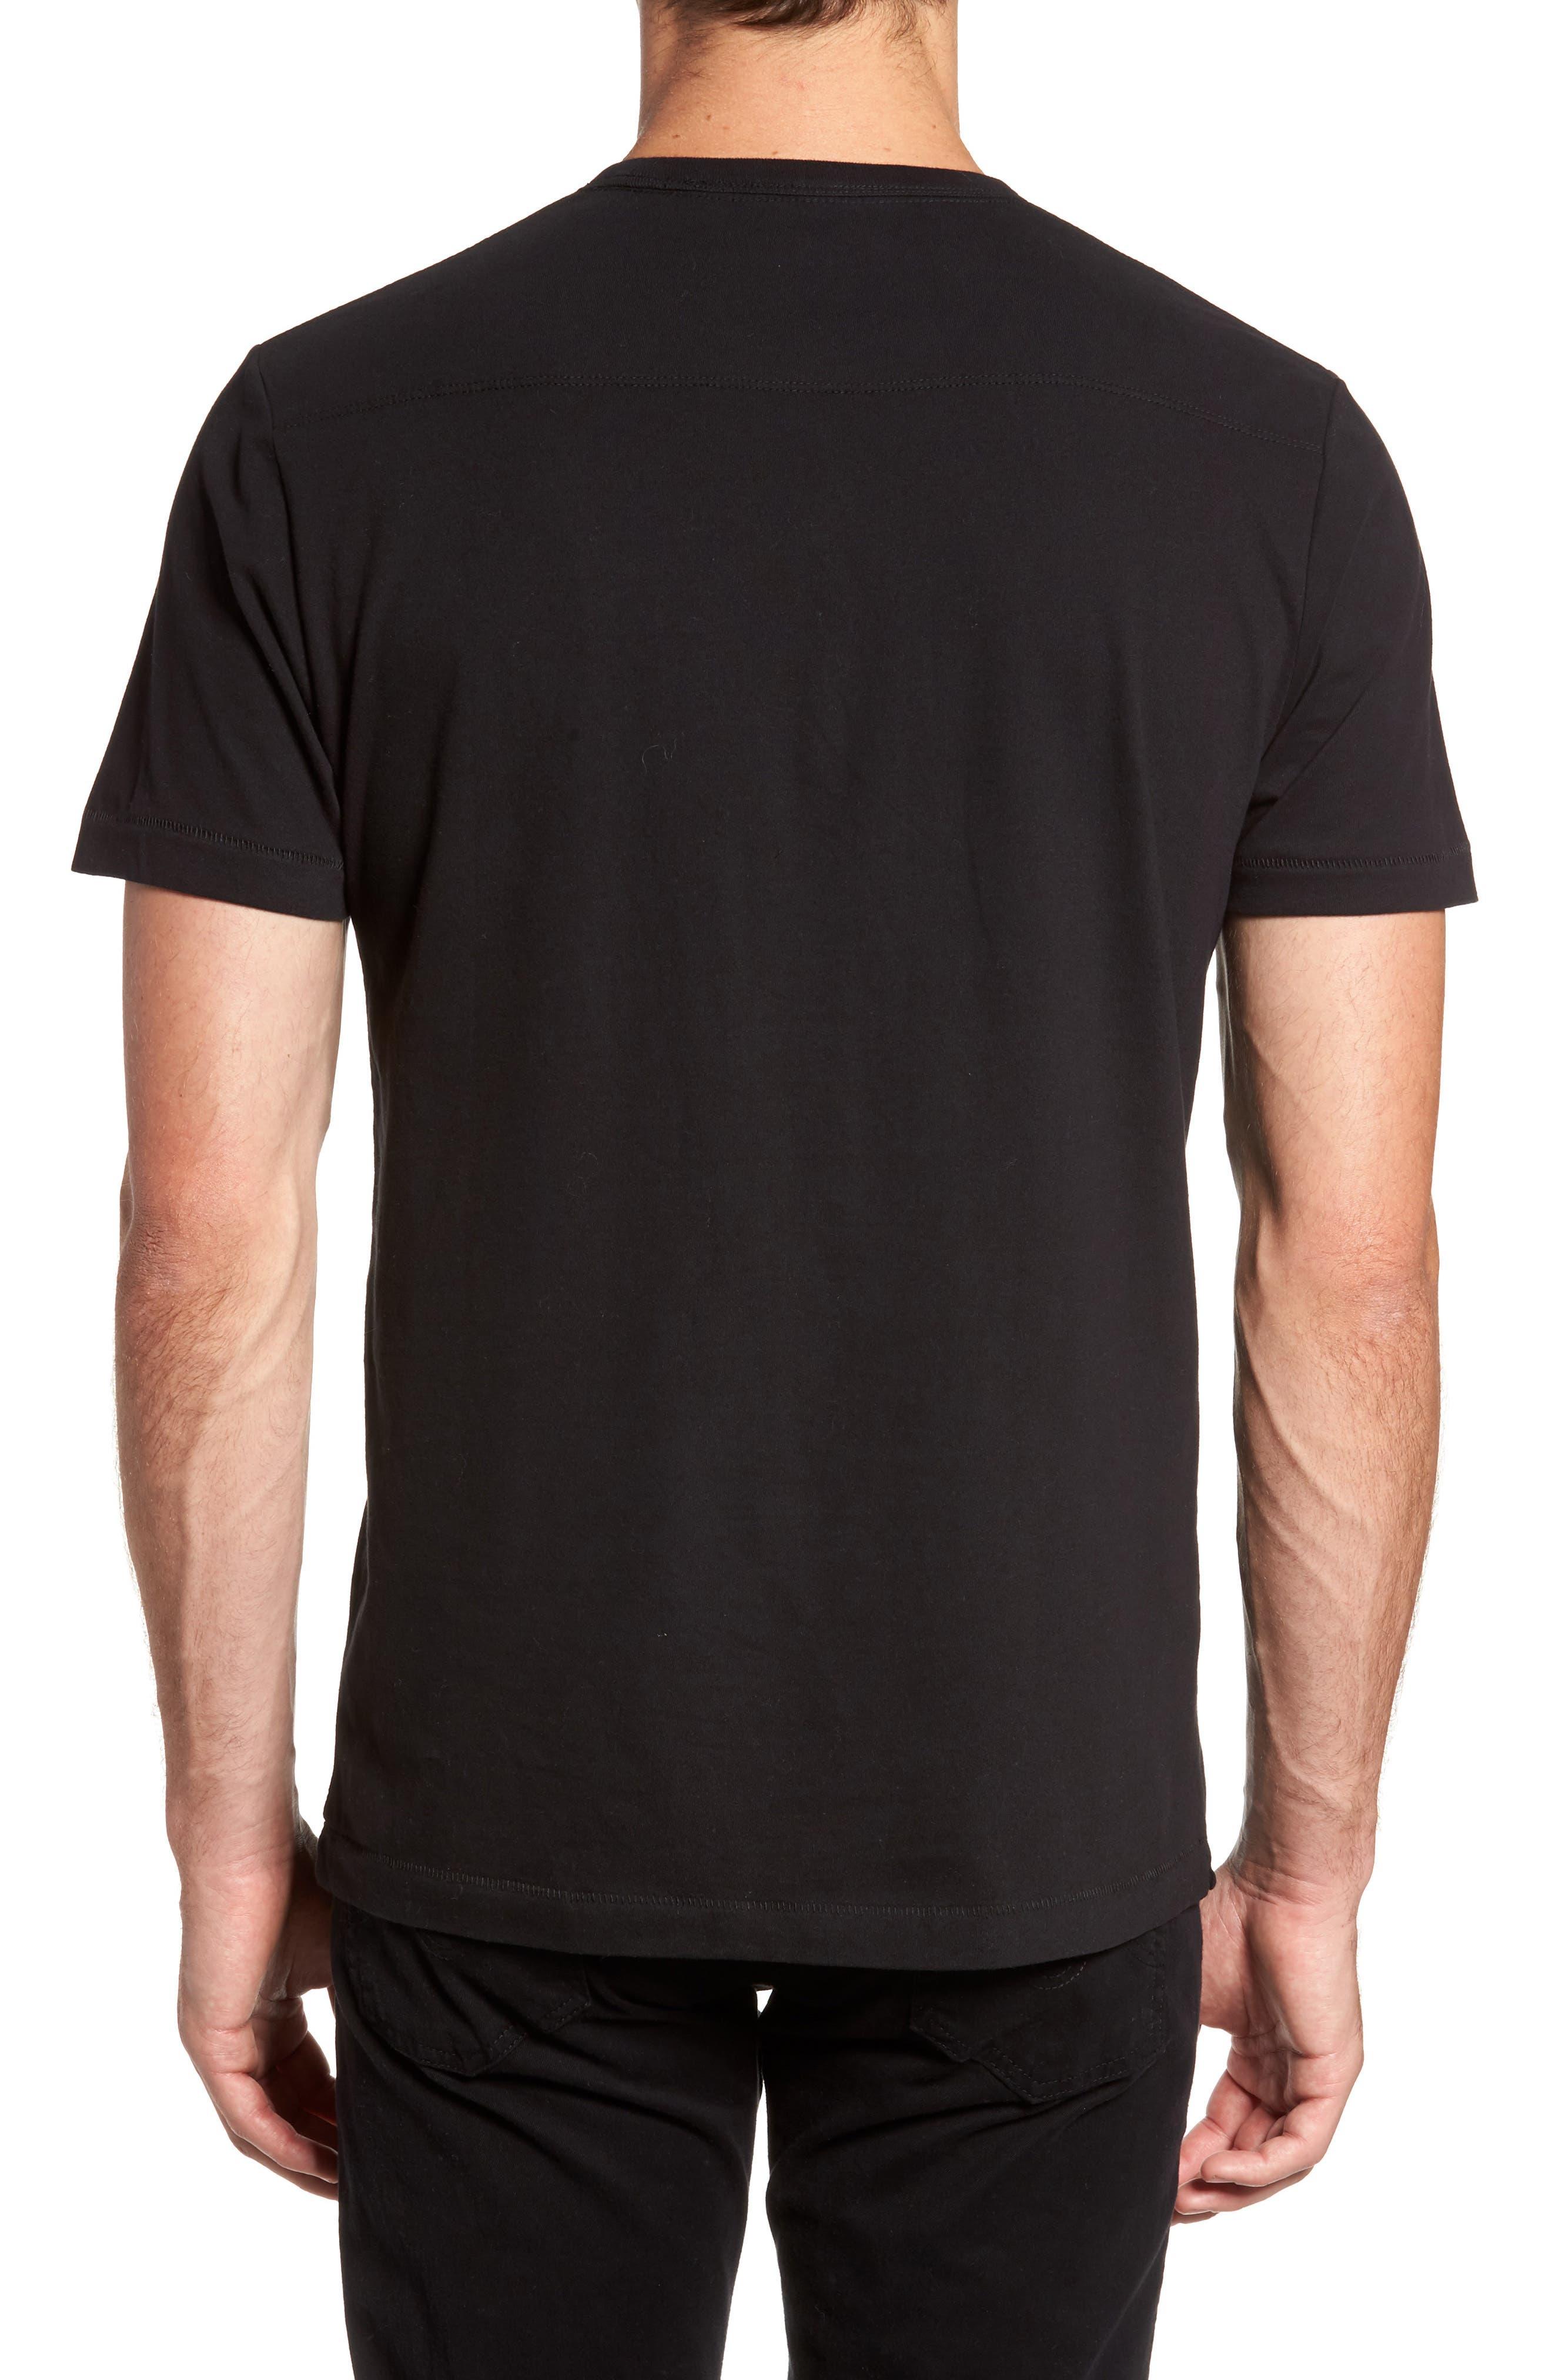 Wink Regular Fit T-Shirt,                             Alternate thumbnail 2, color,                             Black/ White